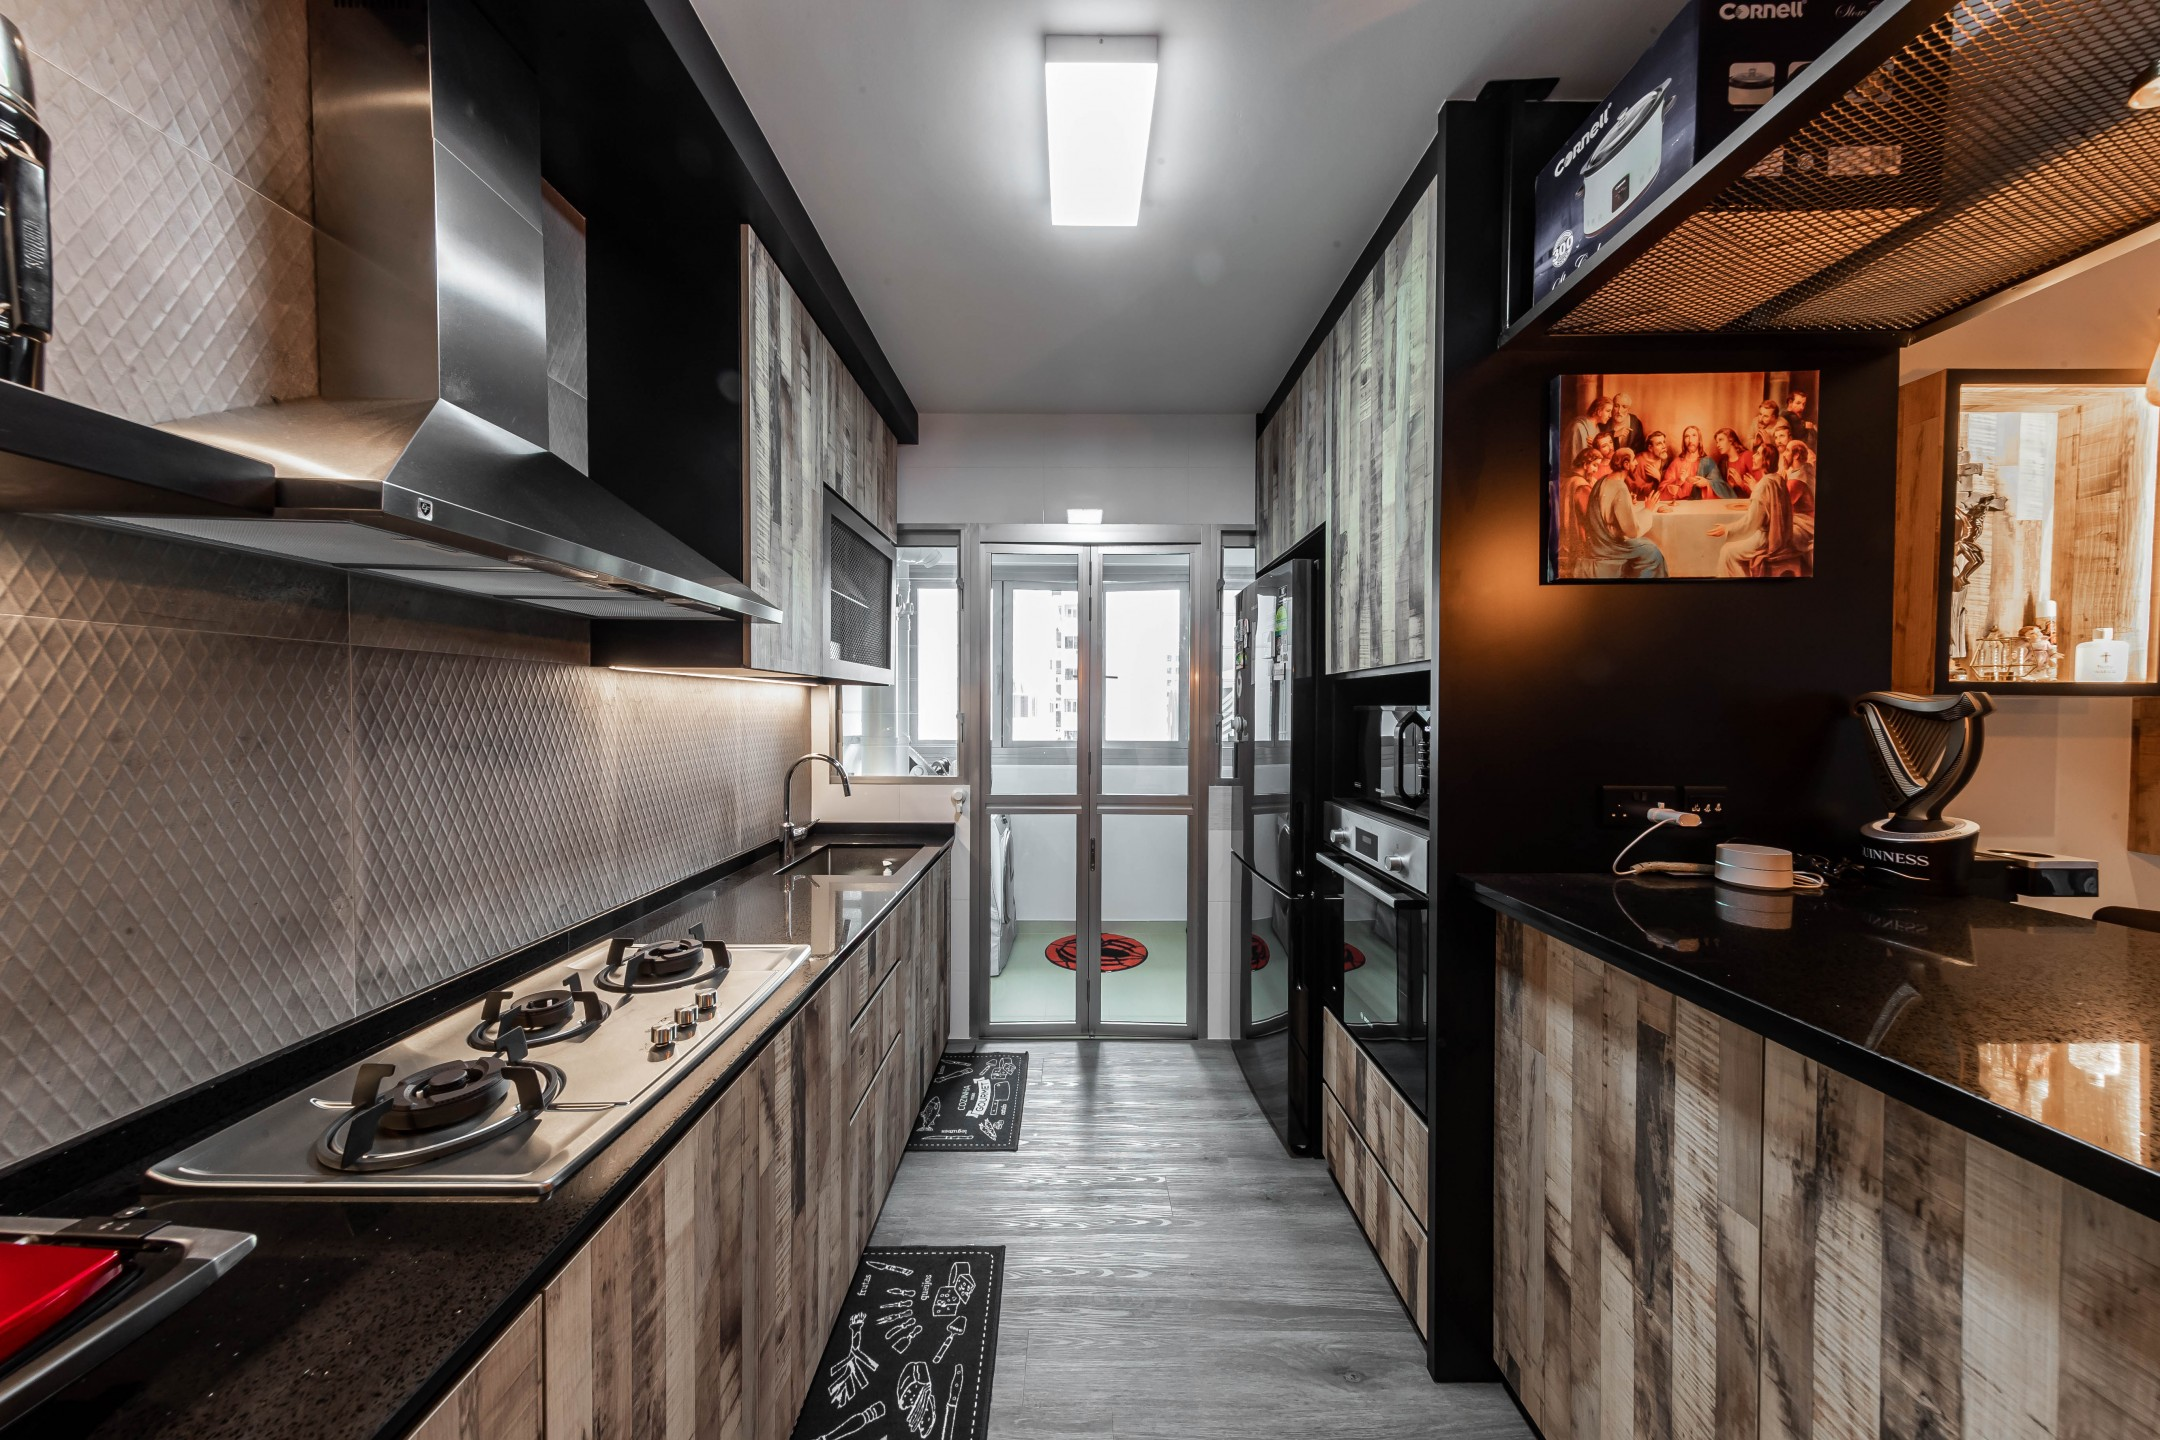 squarerooms renozone northshore industrial home hdb renovation style interior design kitchen counters black dark grey